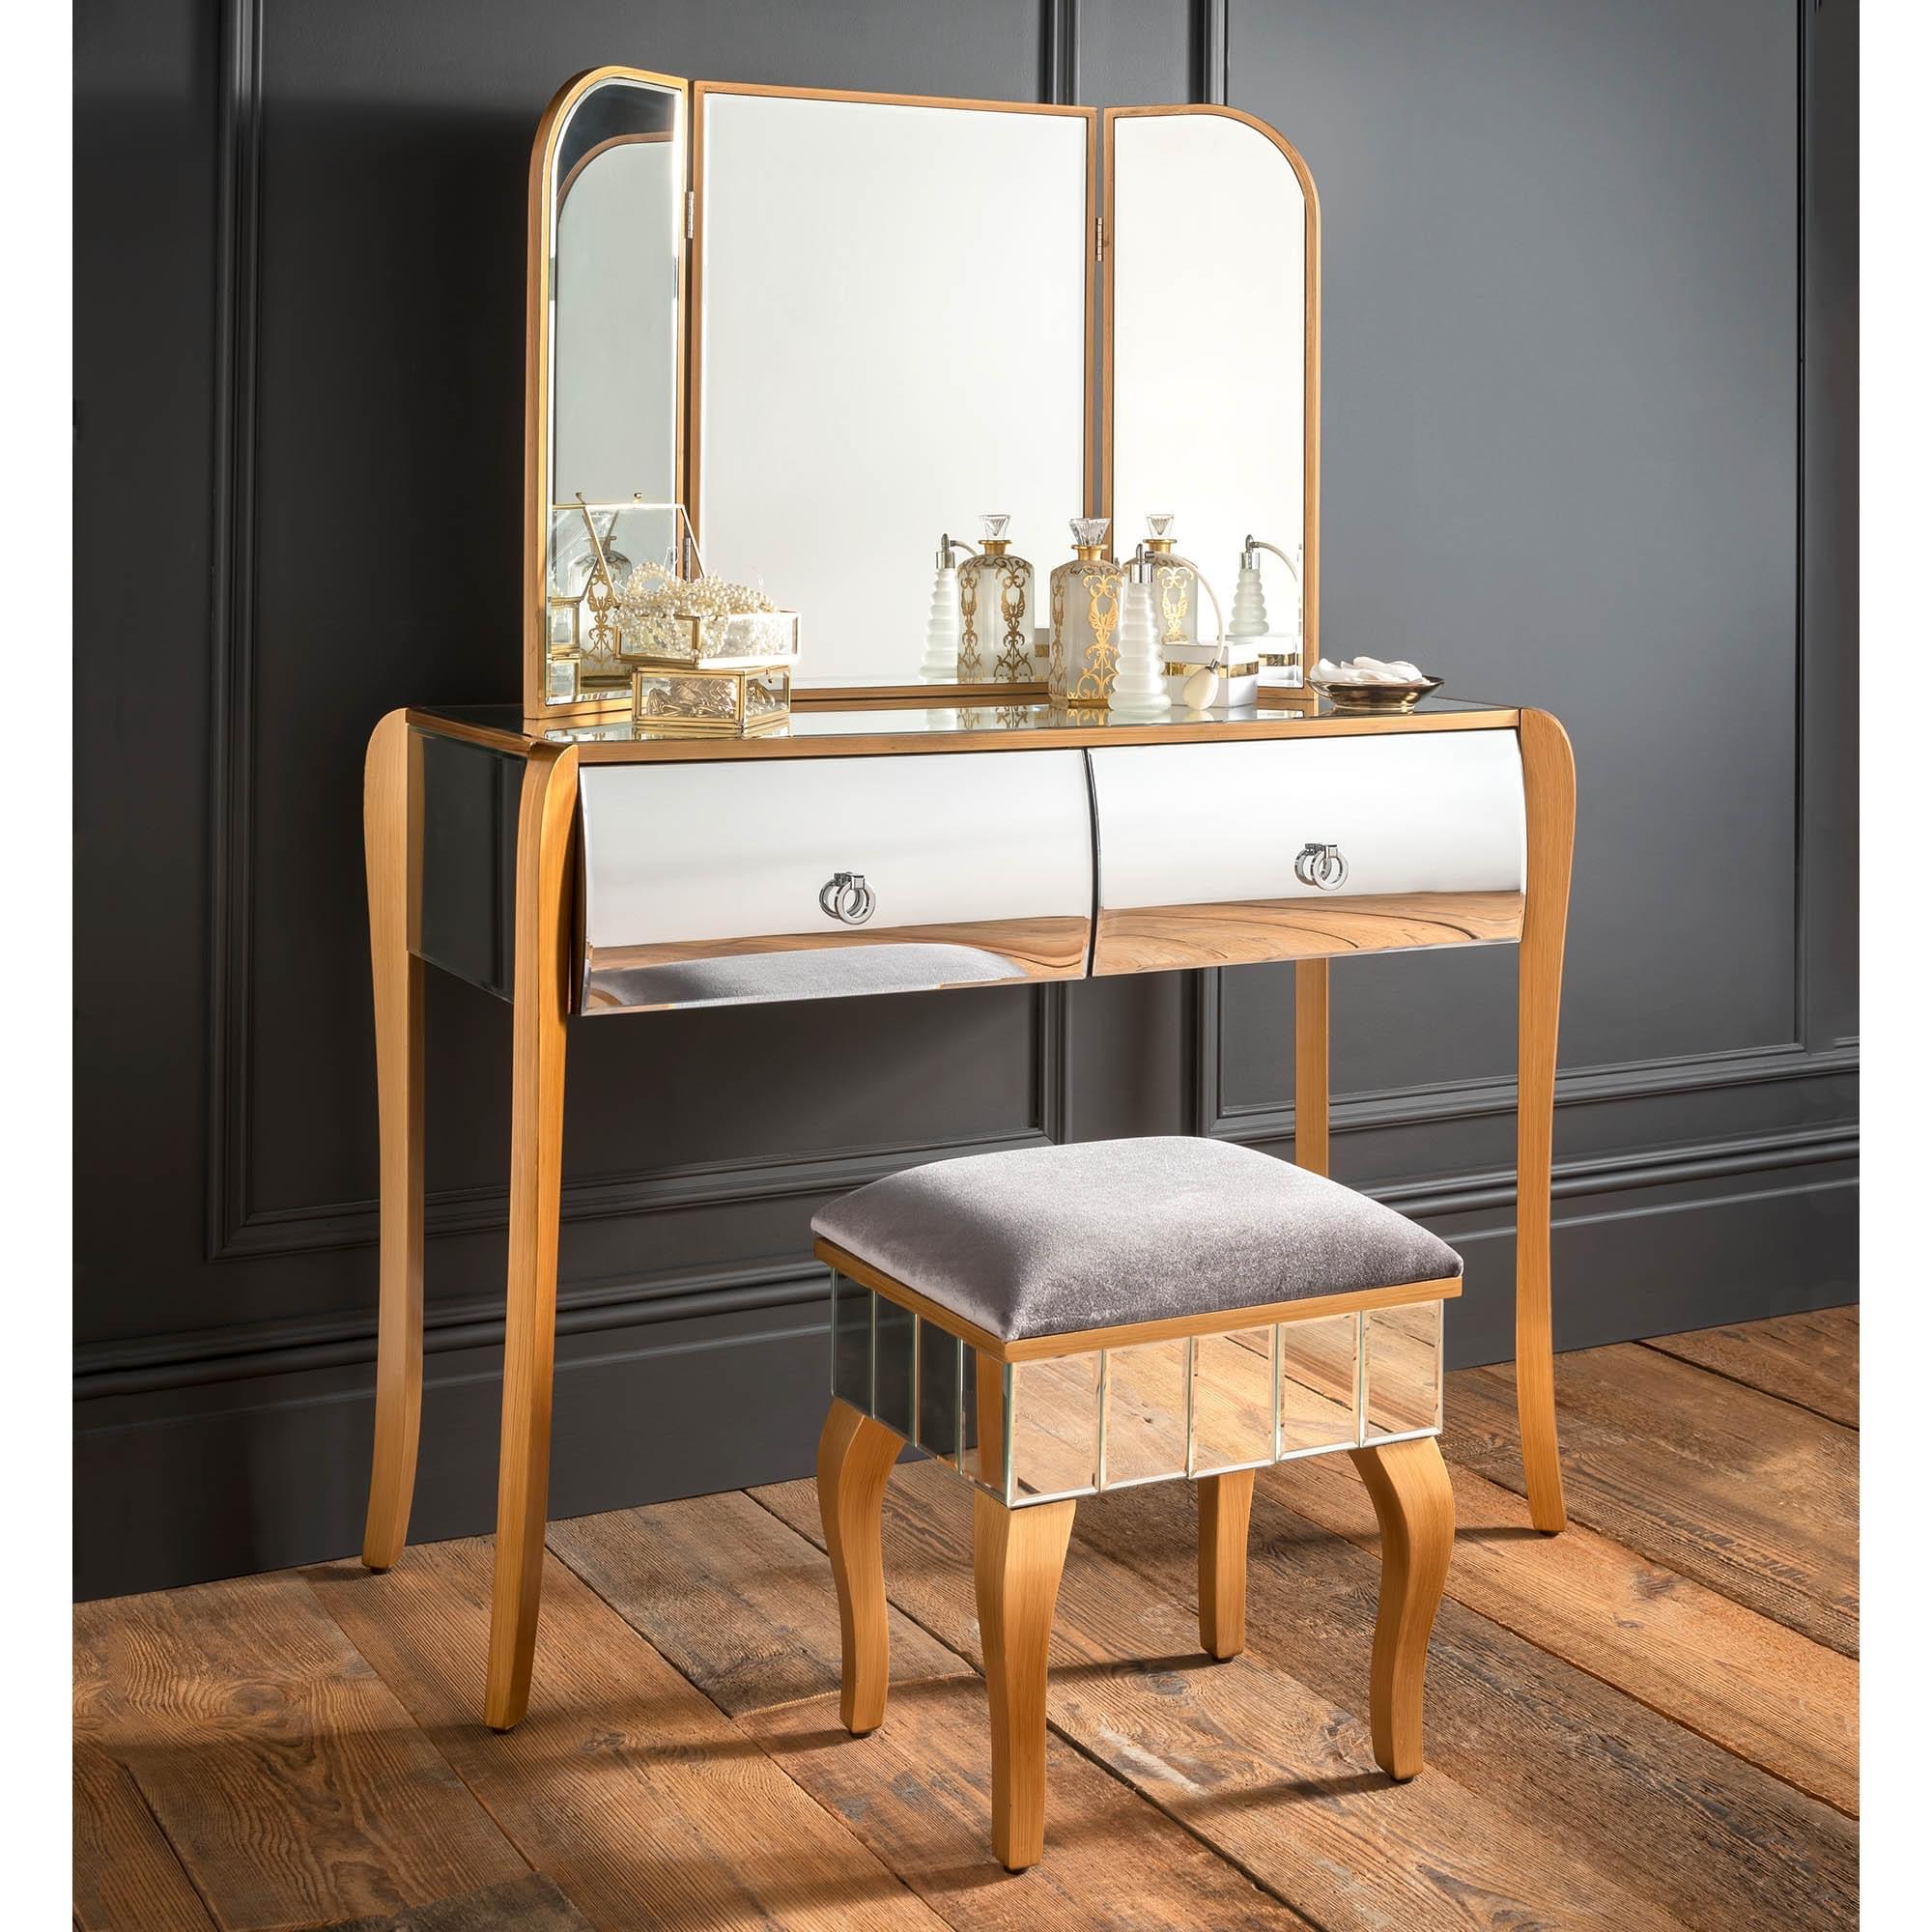 Paris Mirrored Dressing Table Set Venetian Mirrored Furniture Online